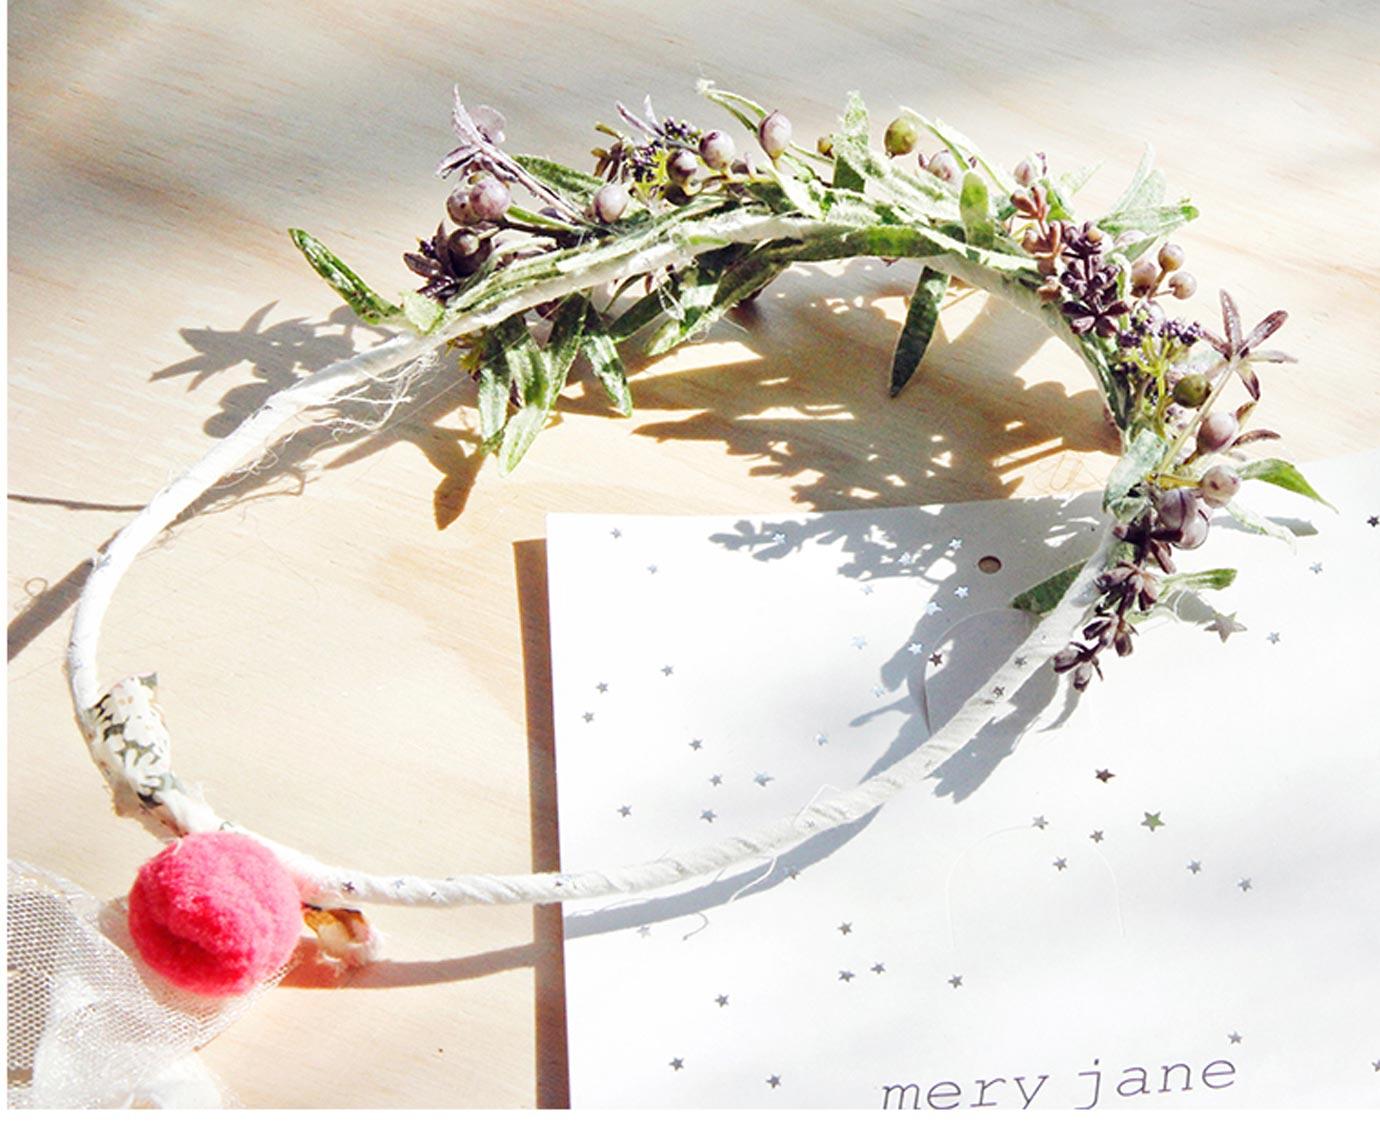 Haarkrans 'Mery jane'